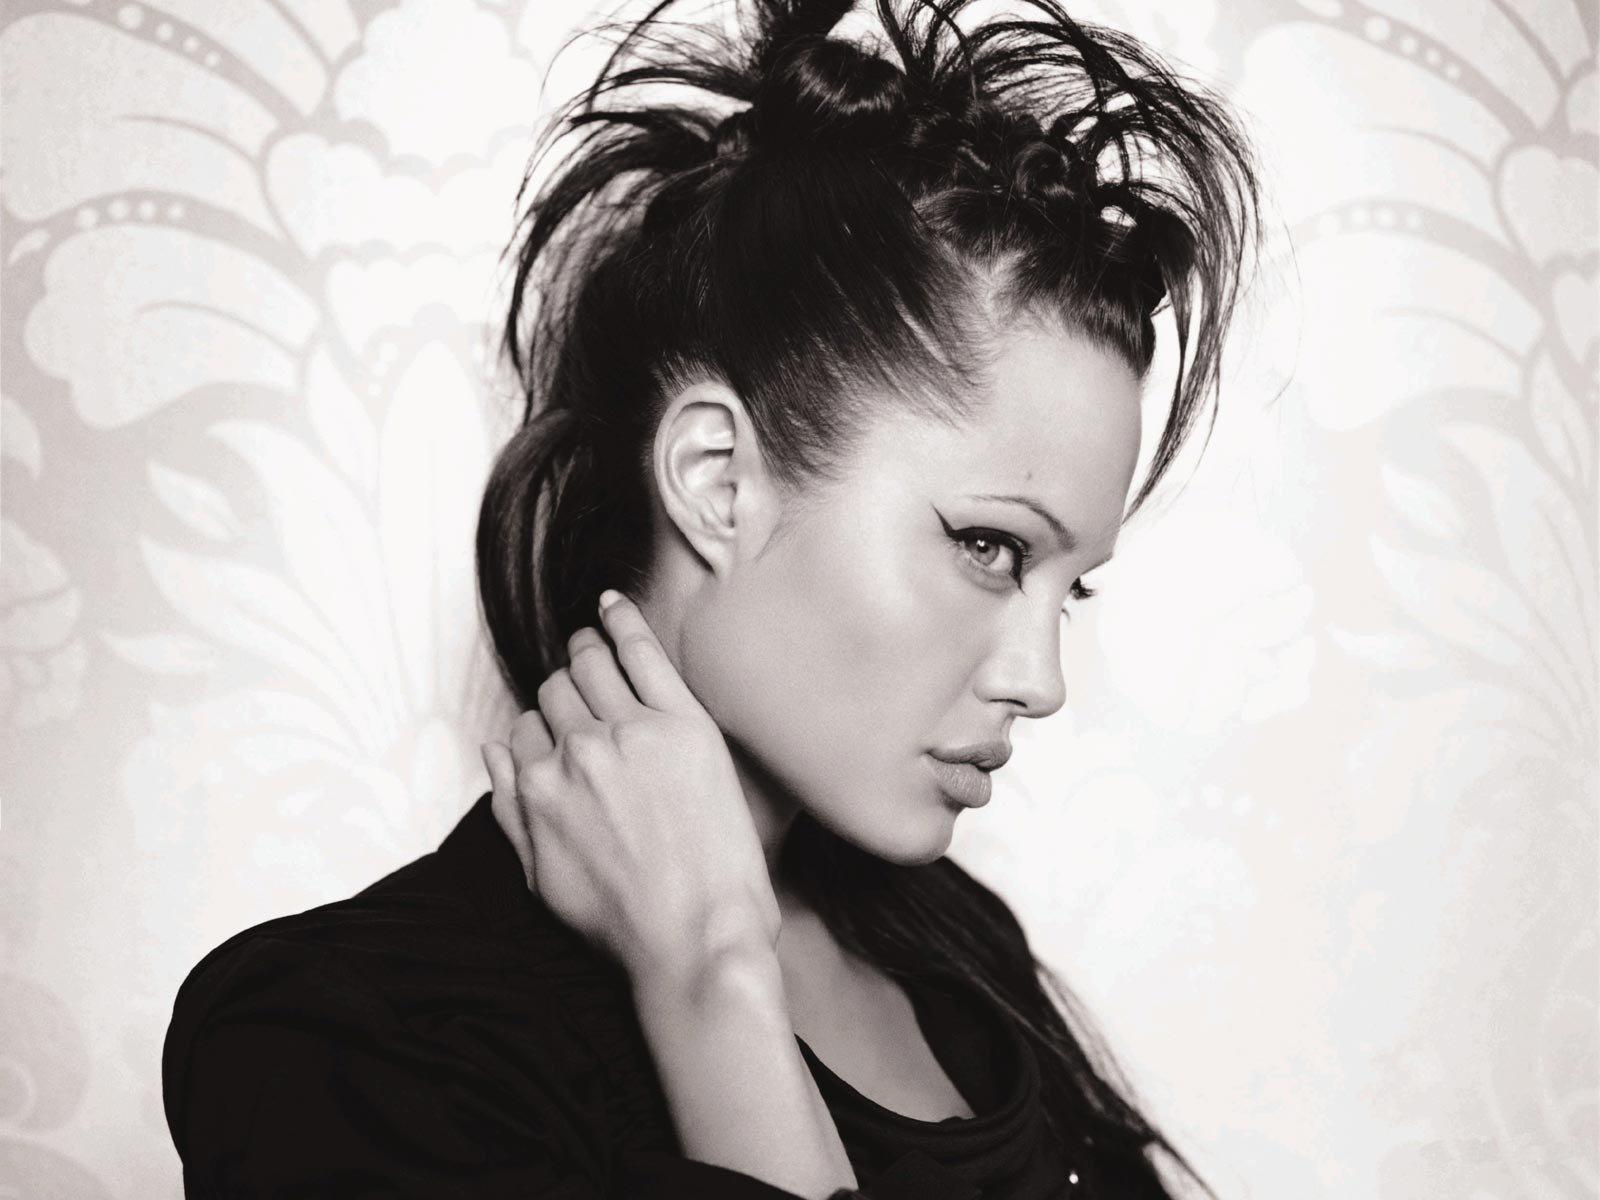 http://1.bp.blogspot.com/_UNJGKYqQ4vA/TGpIcVeHn9I/AAAAAAAAAE4/vkYiVpv_Gt4/s1600/Angelina-Jolie-Wide-Screen-Wallpaper.jpg